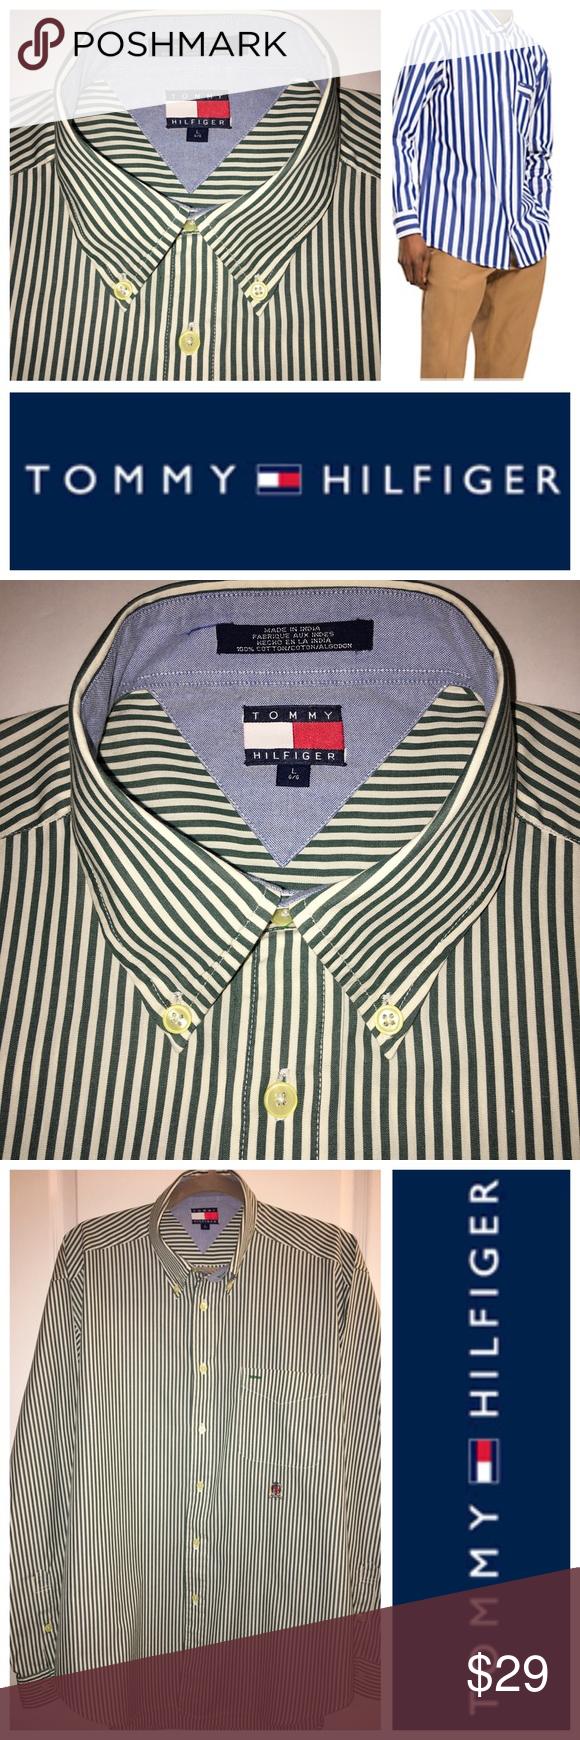 Men S Tommy Hilfiger Long Sleeve Button Down Shirt Tommy Hilfiger Long Sleeve Tommy Hilfiger Hilfiger [ 1740 x 580 Pixel ]